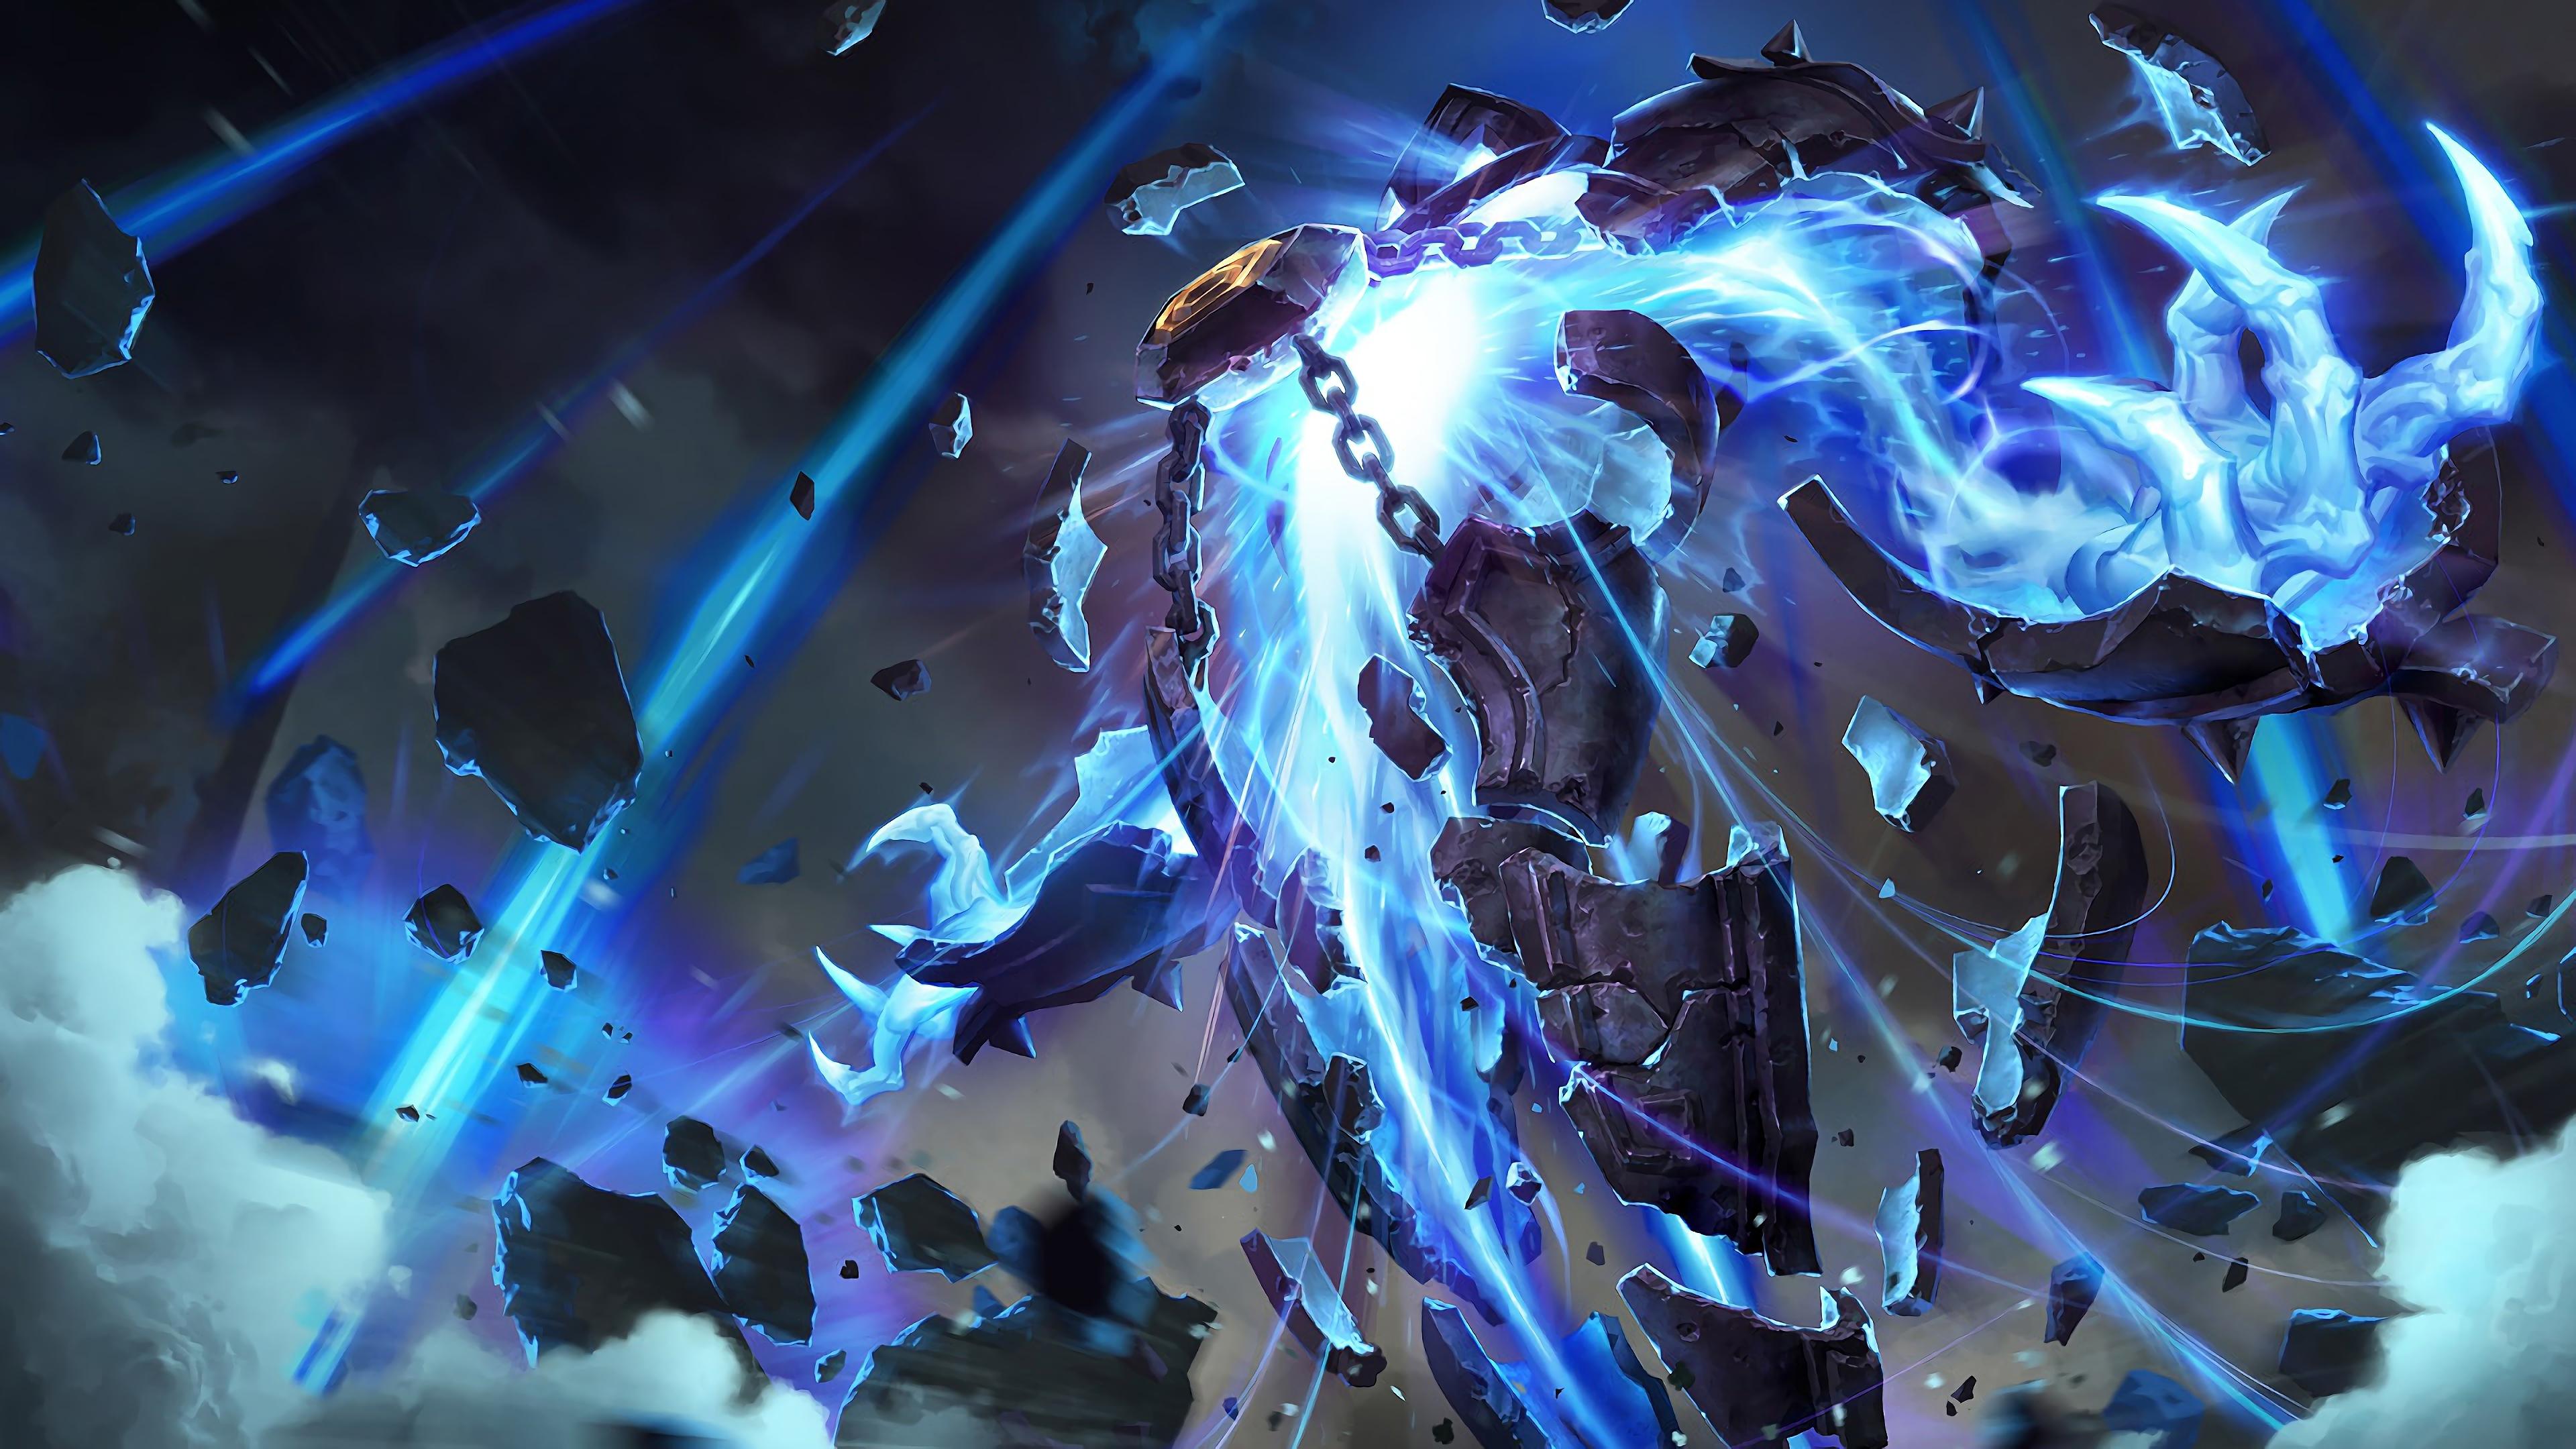 xerath lol splash art league of legends 1574100472 - Xerath LoL Splash Art League of Legends - Xerath, league of legends